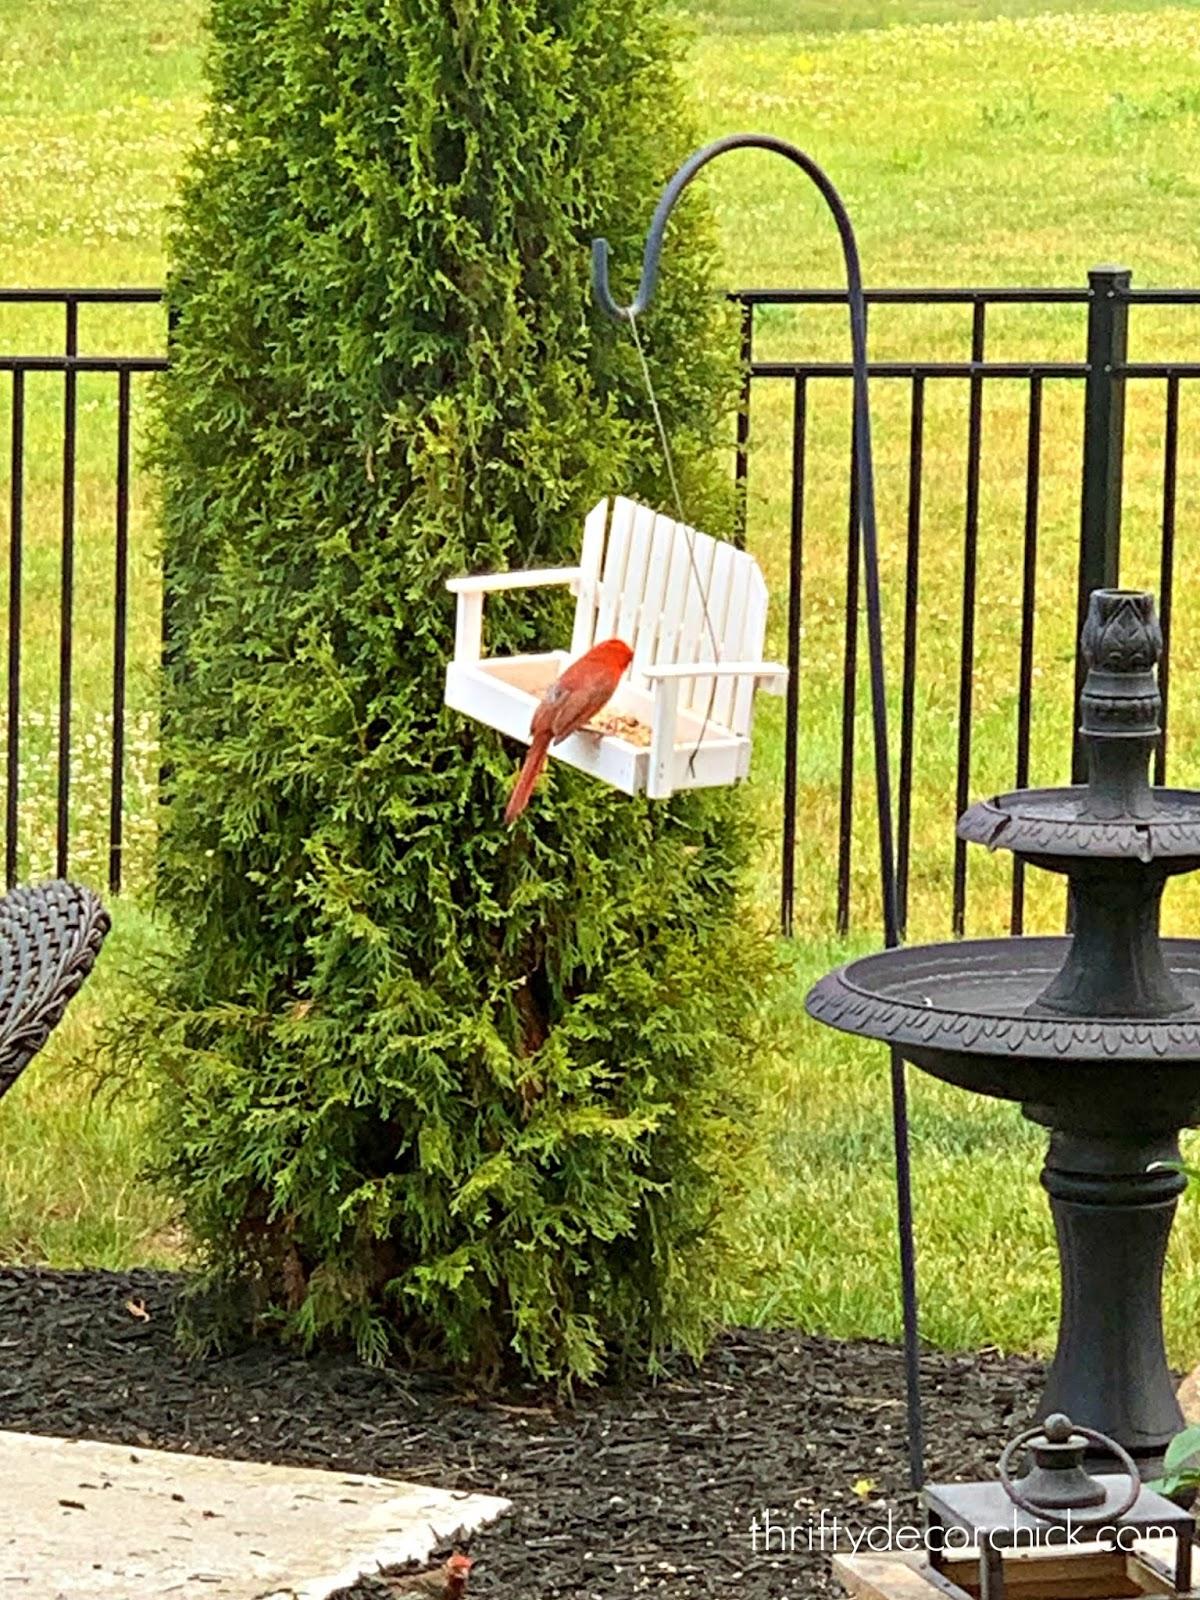 My favorite bird feeders